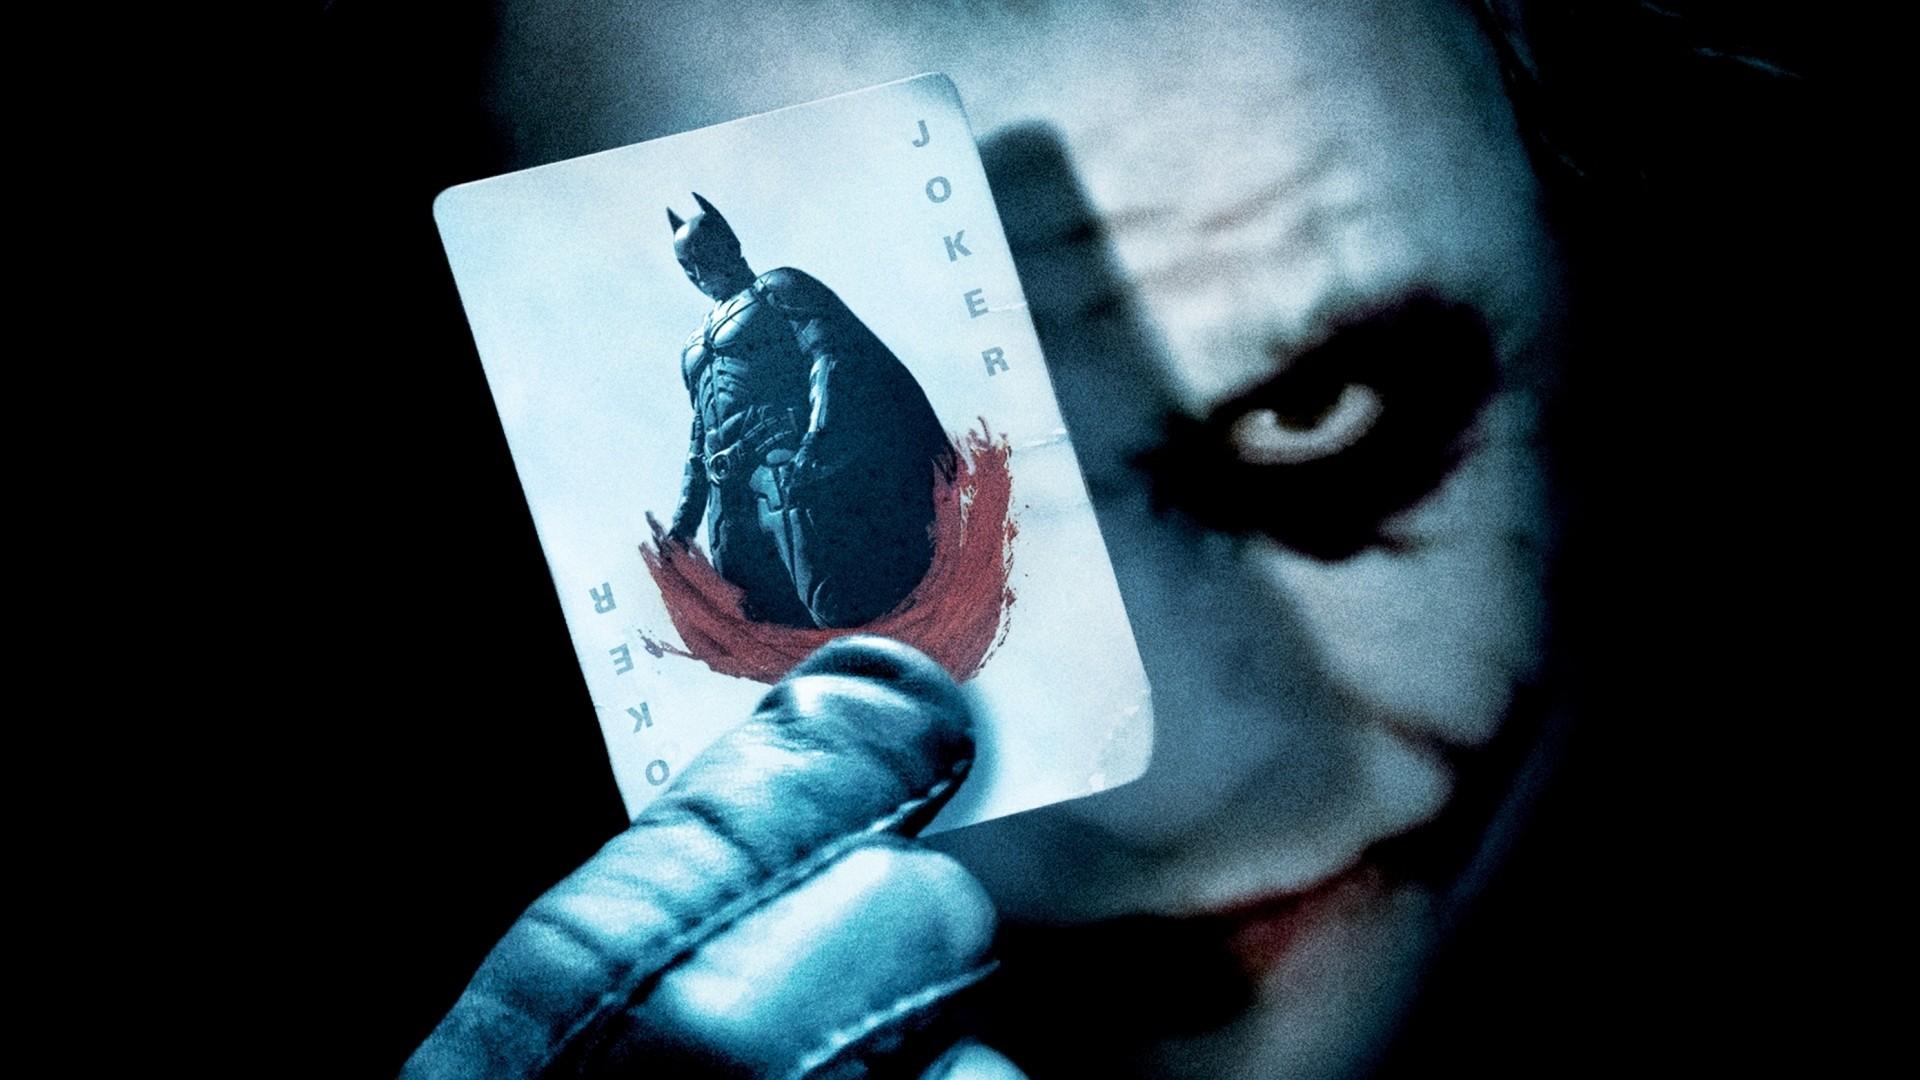 Joker Cool Image